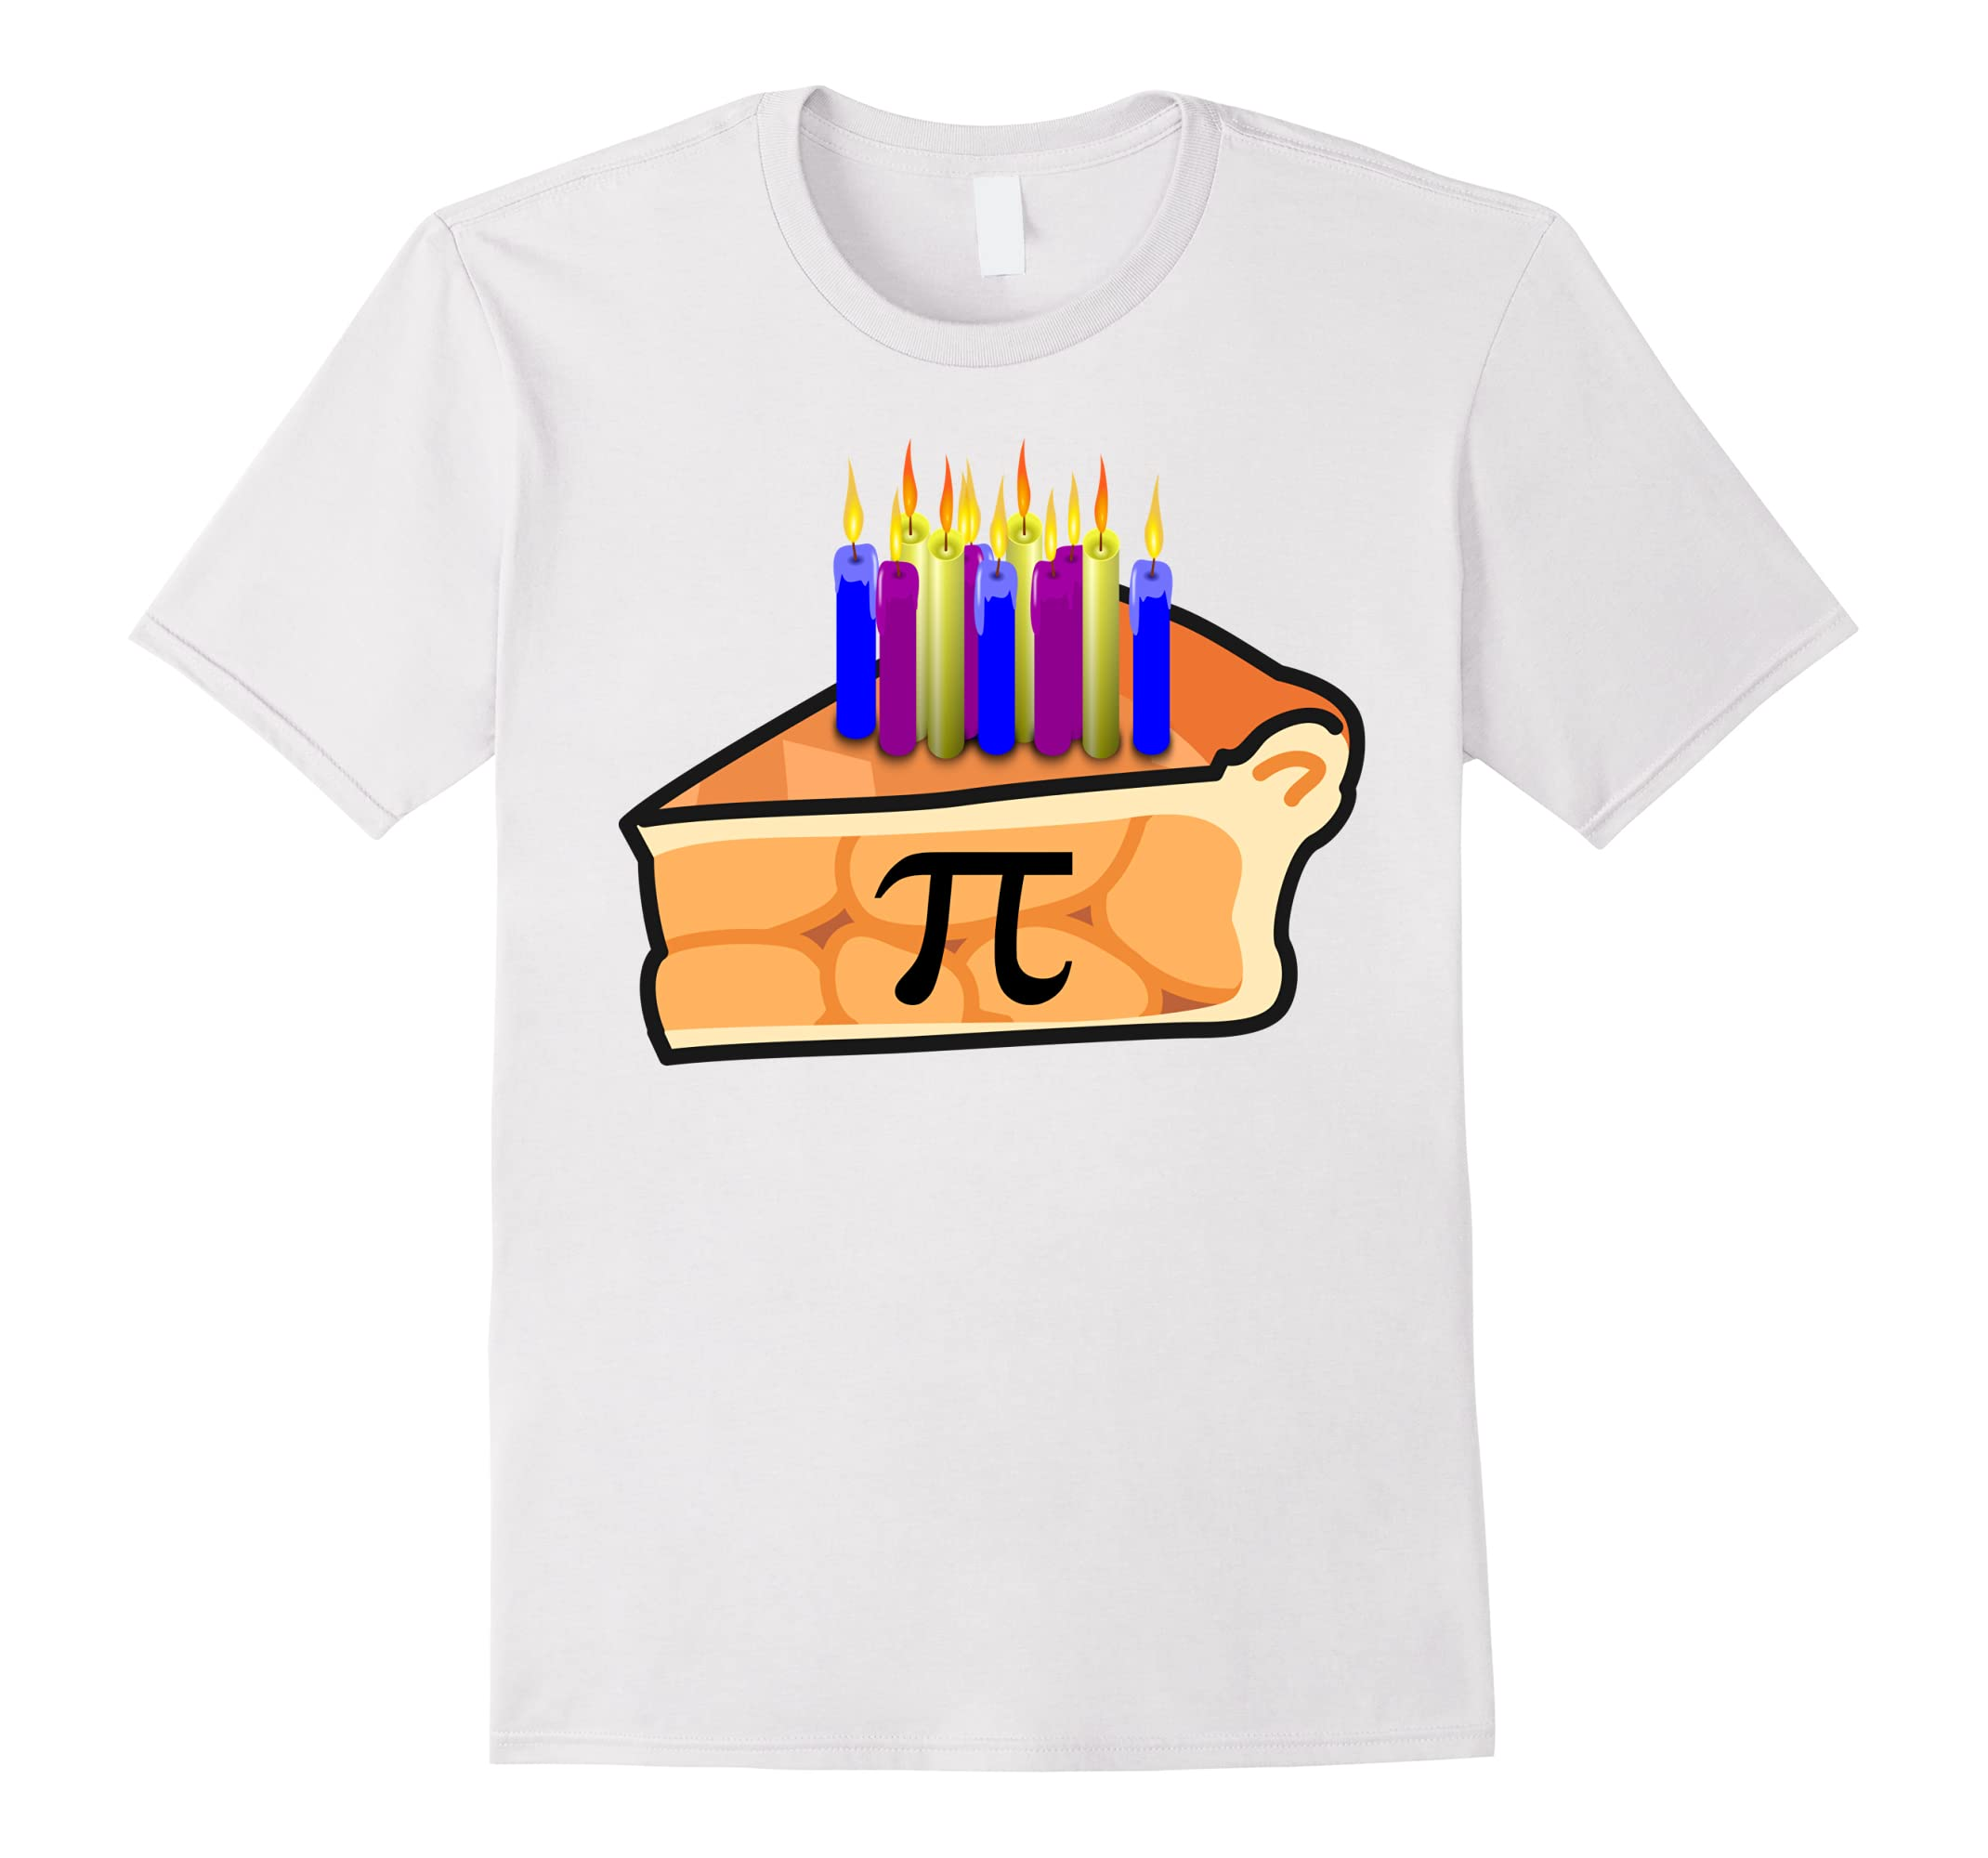 Birthday Shirt 3 14 18 Math Candles-Teesml